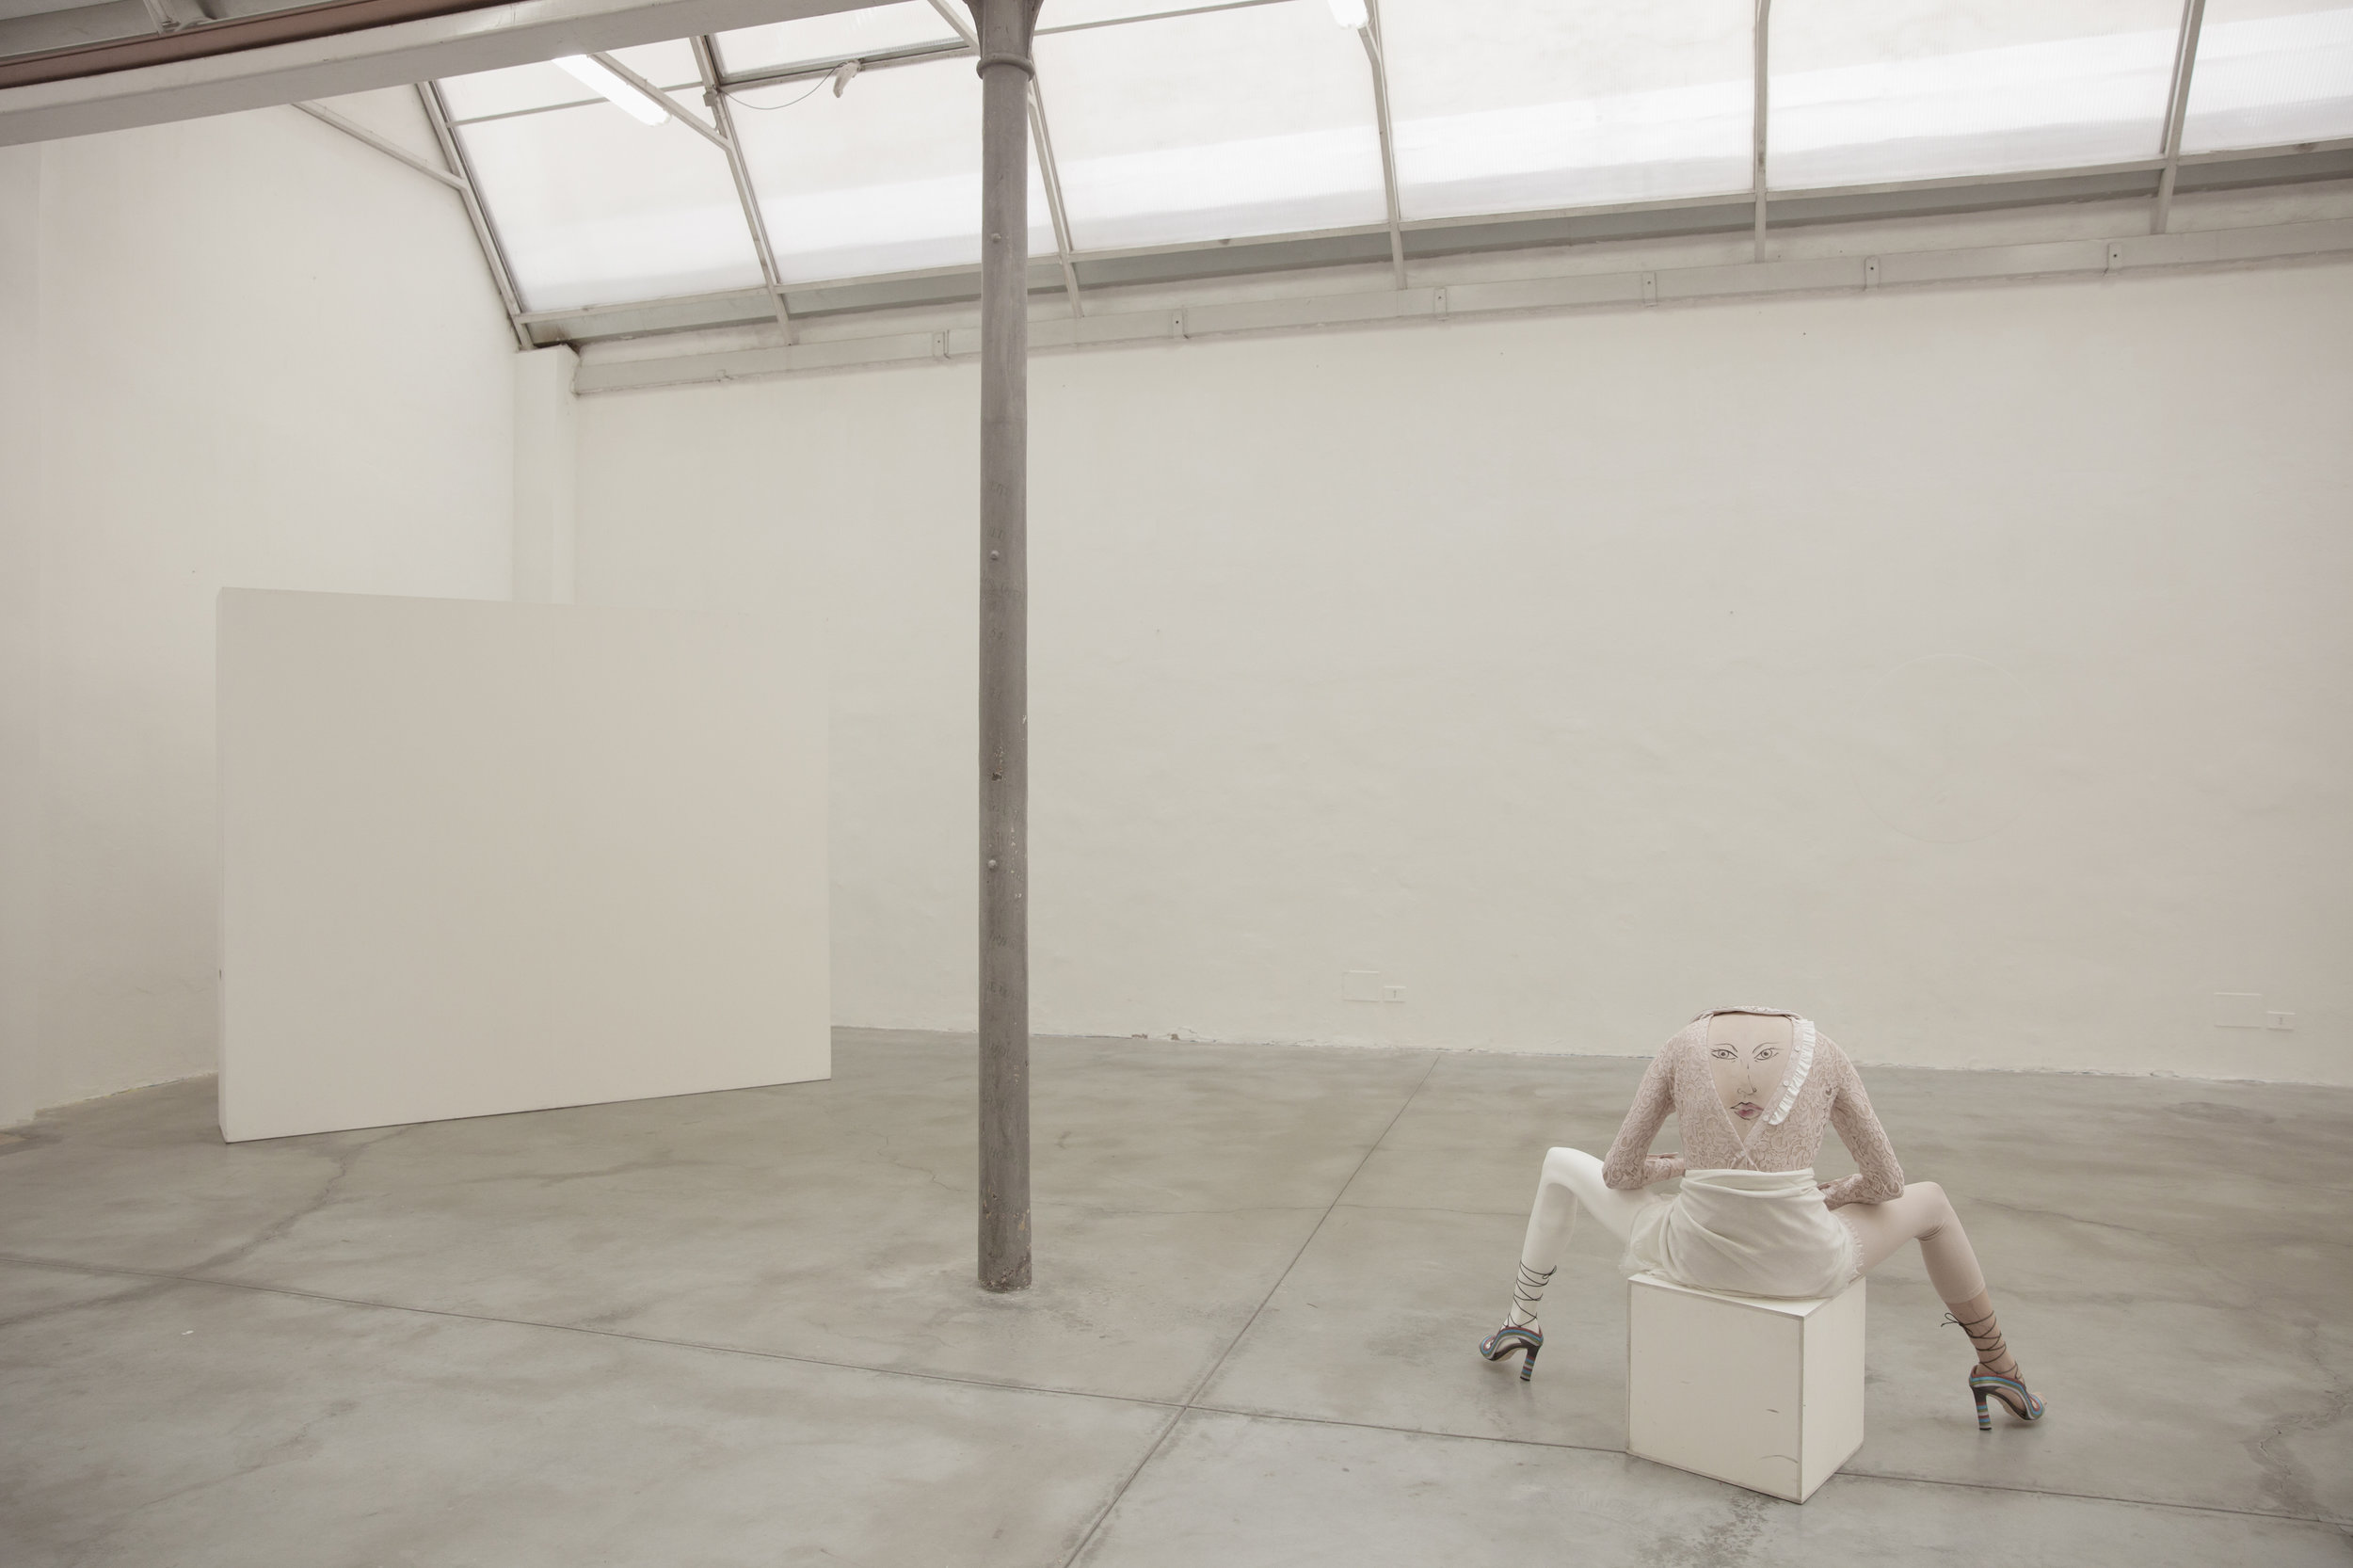 Jumpsuit : Deha /  Scarf : Abstract /  Collar : Tara Jarmon /  Shoes : Paula Cademartori